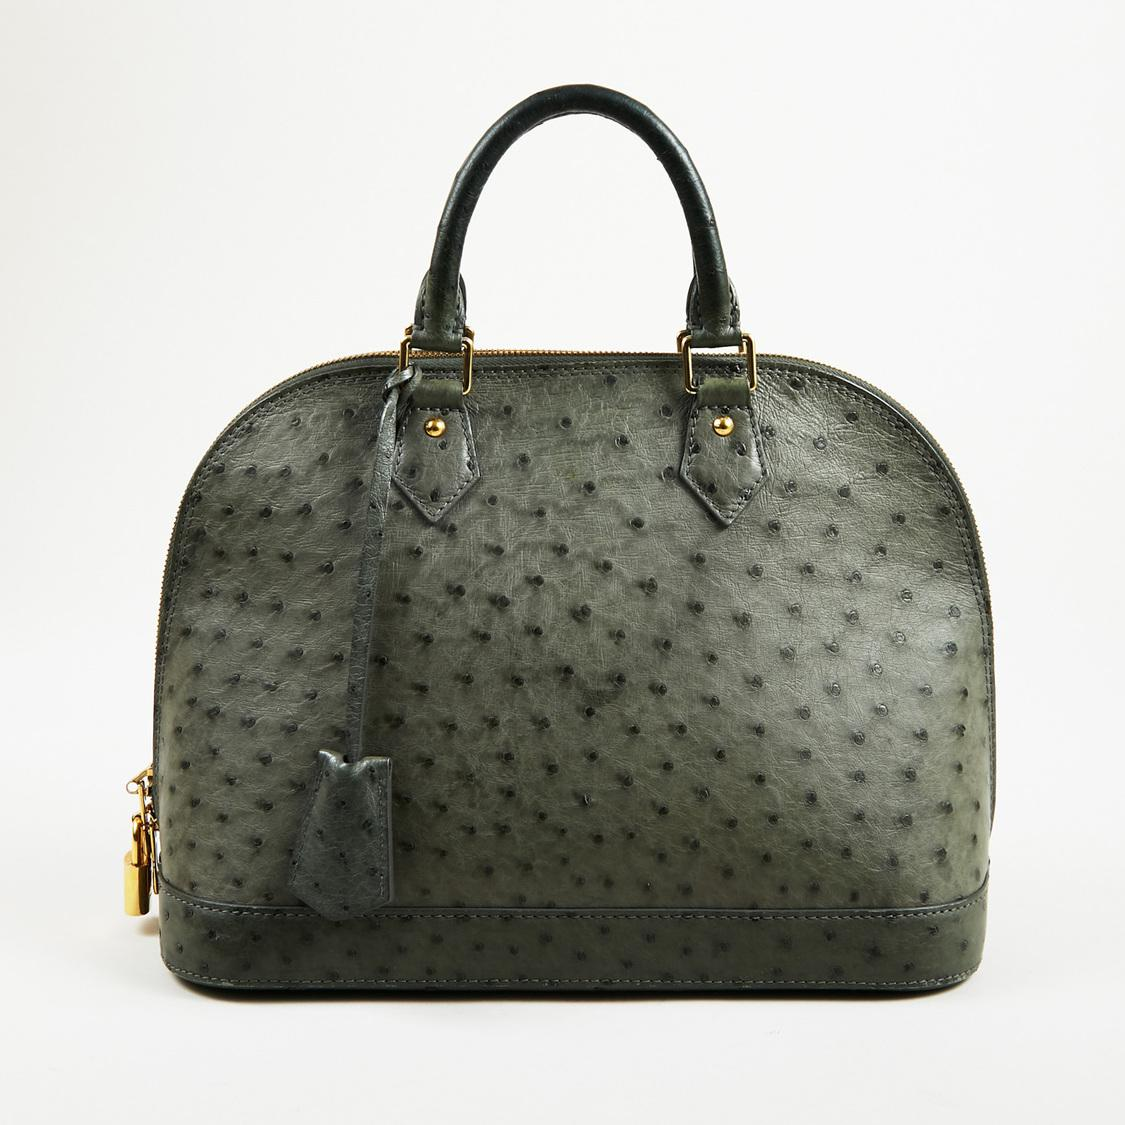 573be757f8 Louis Vuitton